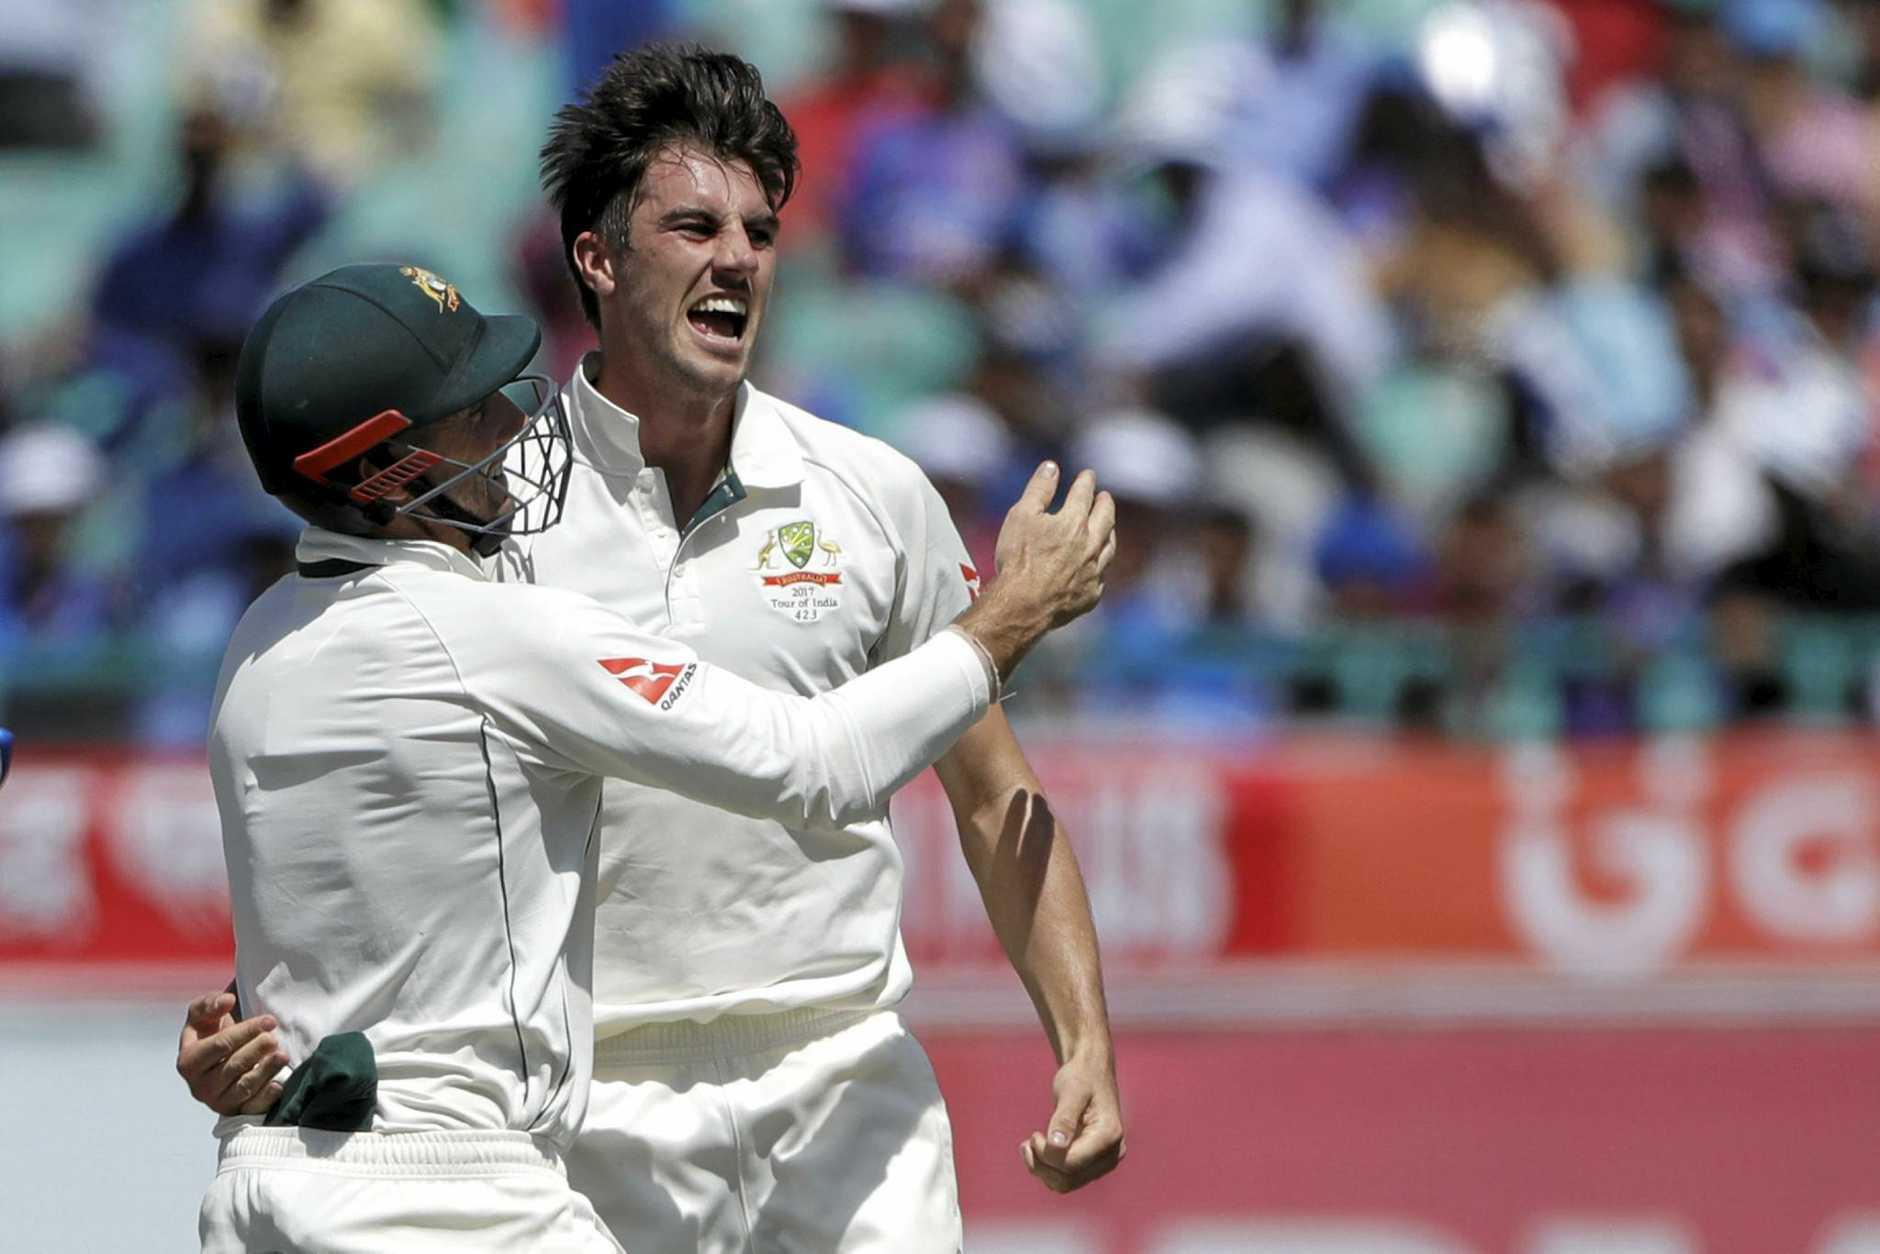 Australia's Pat Cummins, right, celebrates the dismissal of India's Lokesh Rahul